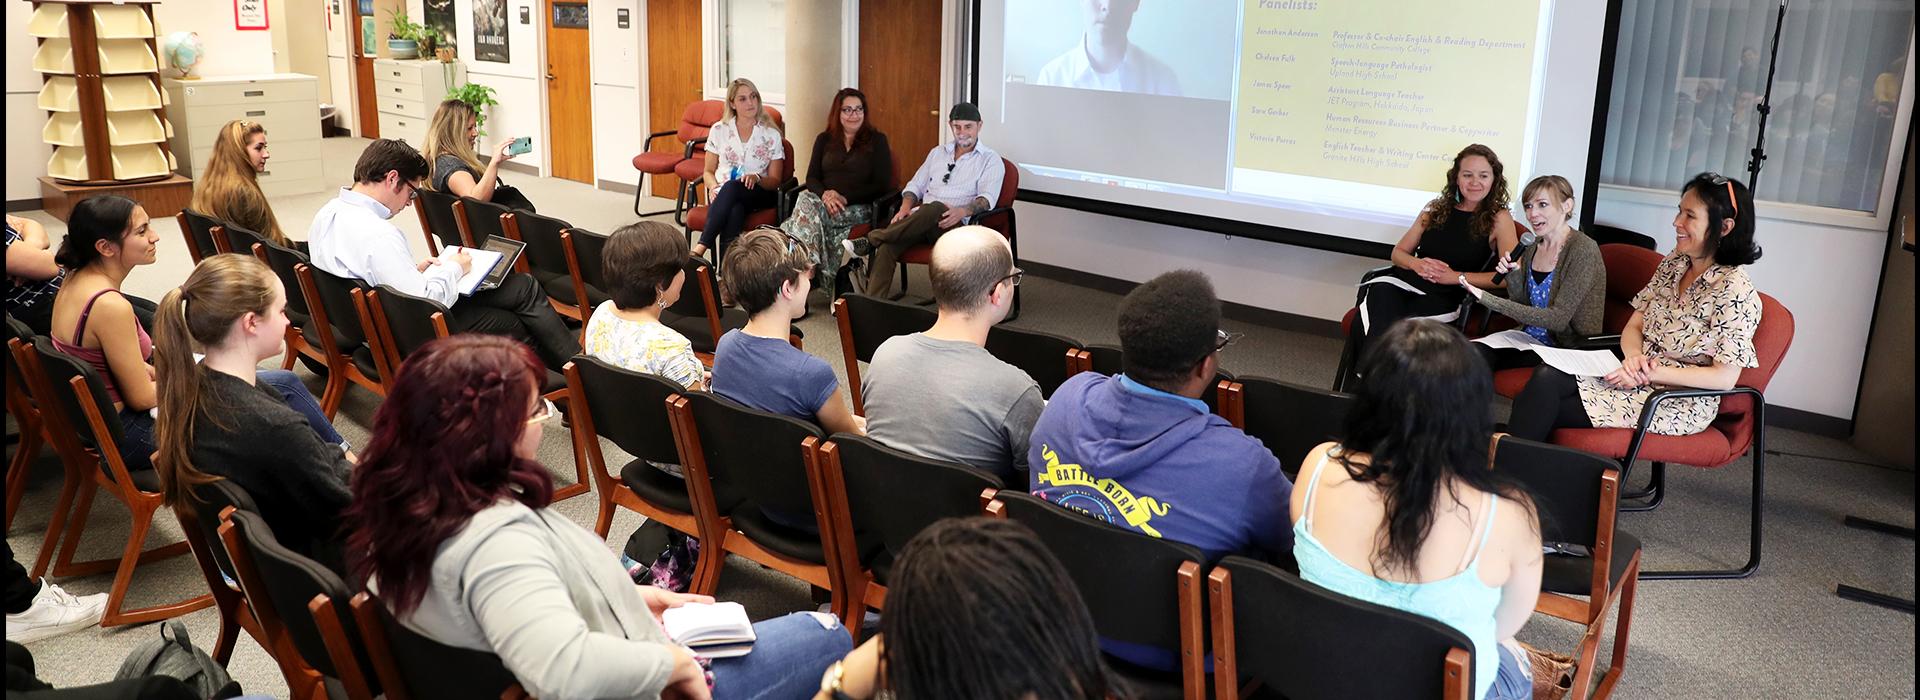 CSUSB English department hosts Strategic Employability in English alumni panel